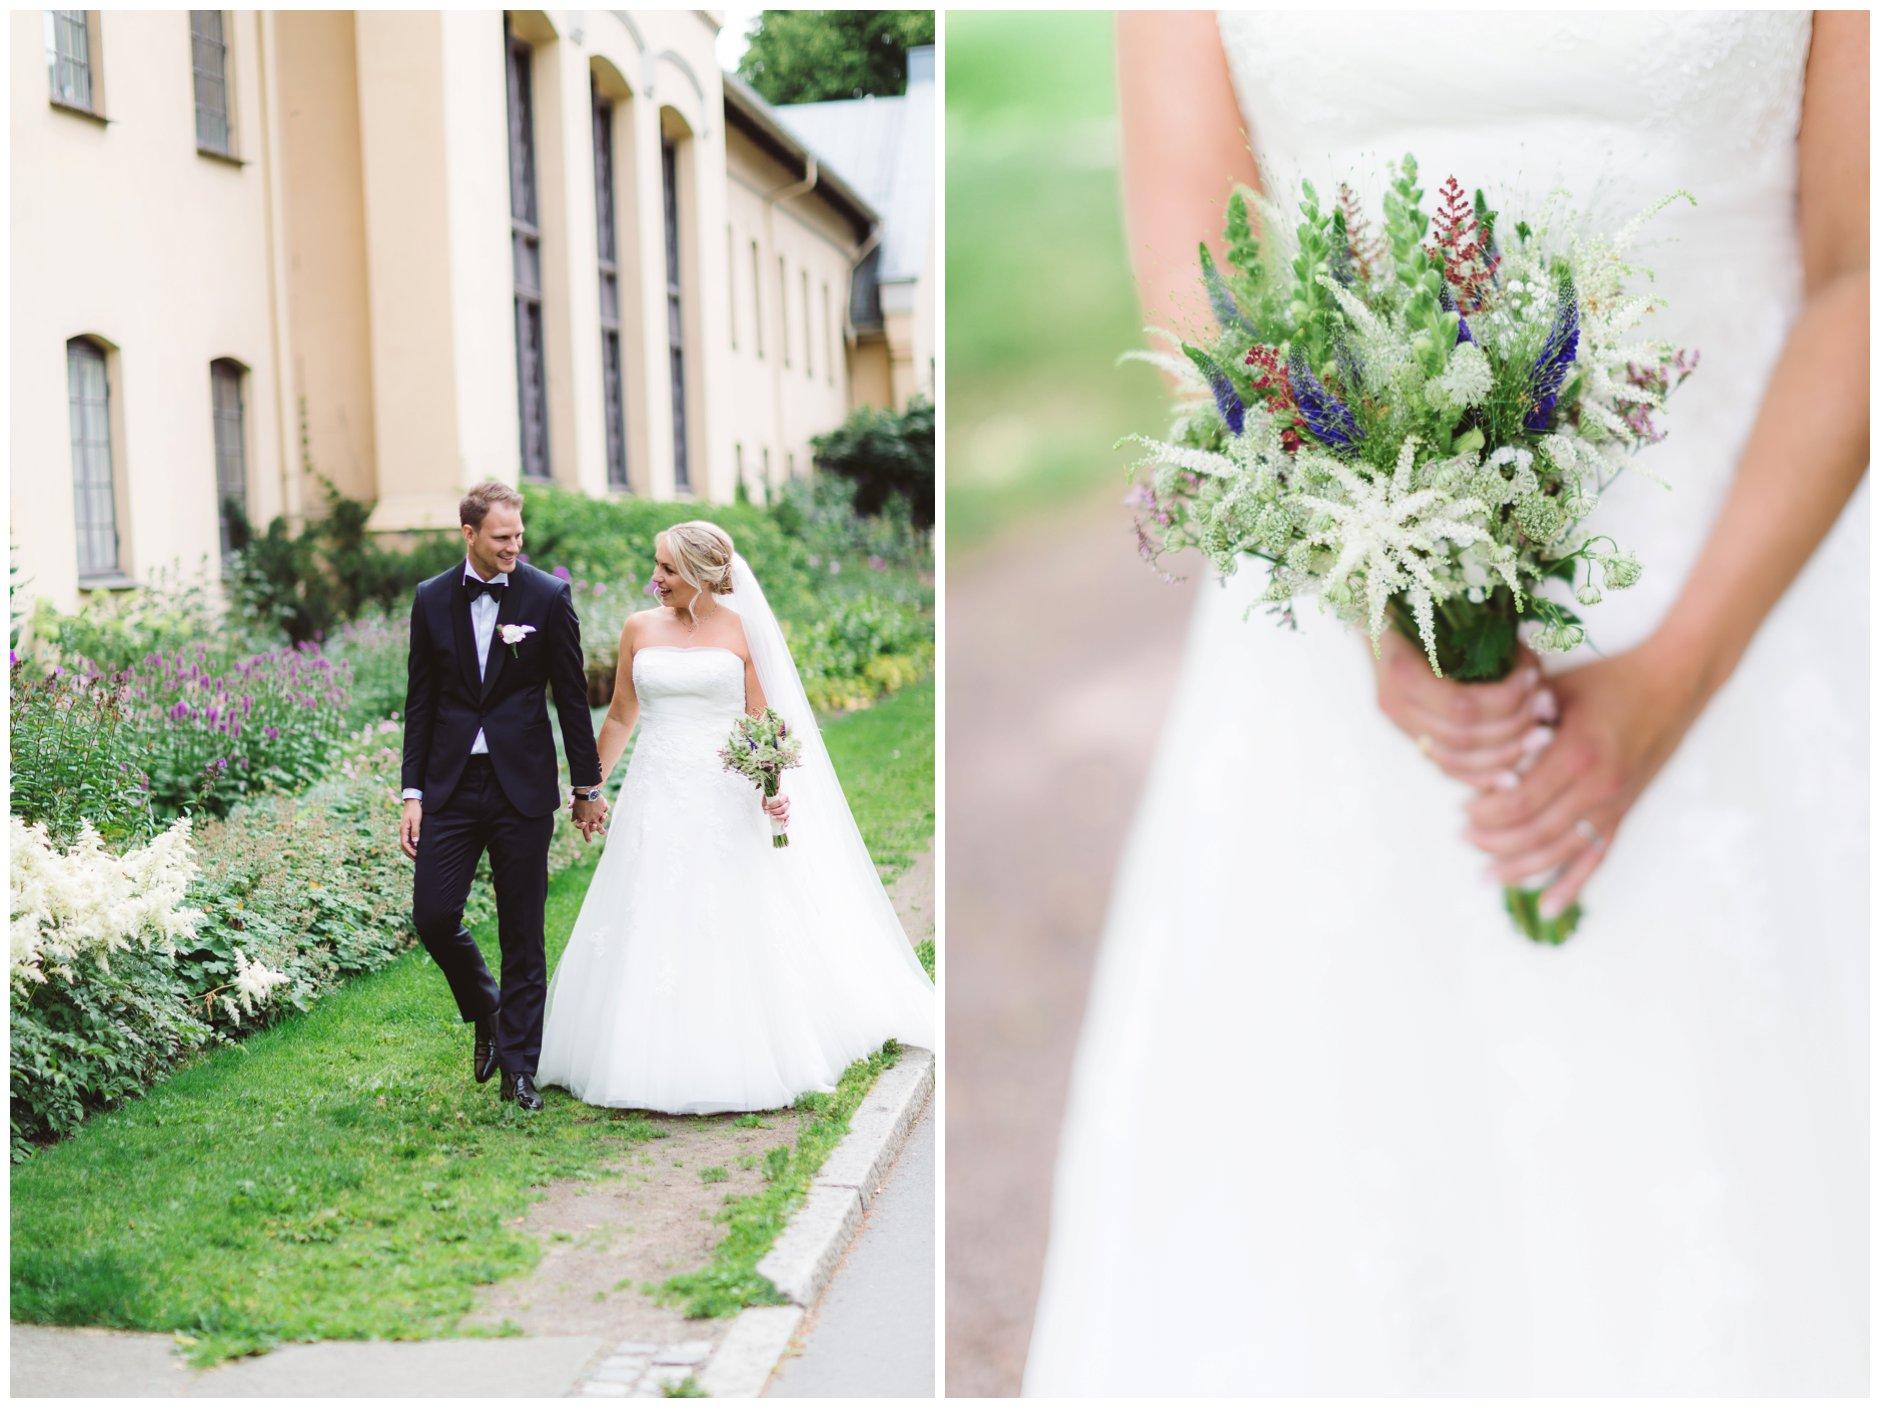 Slottsparken Dronningparken bryllup